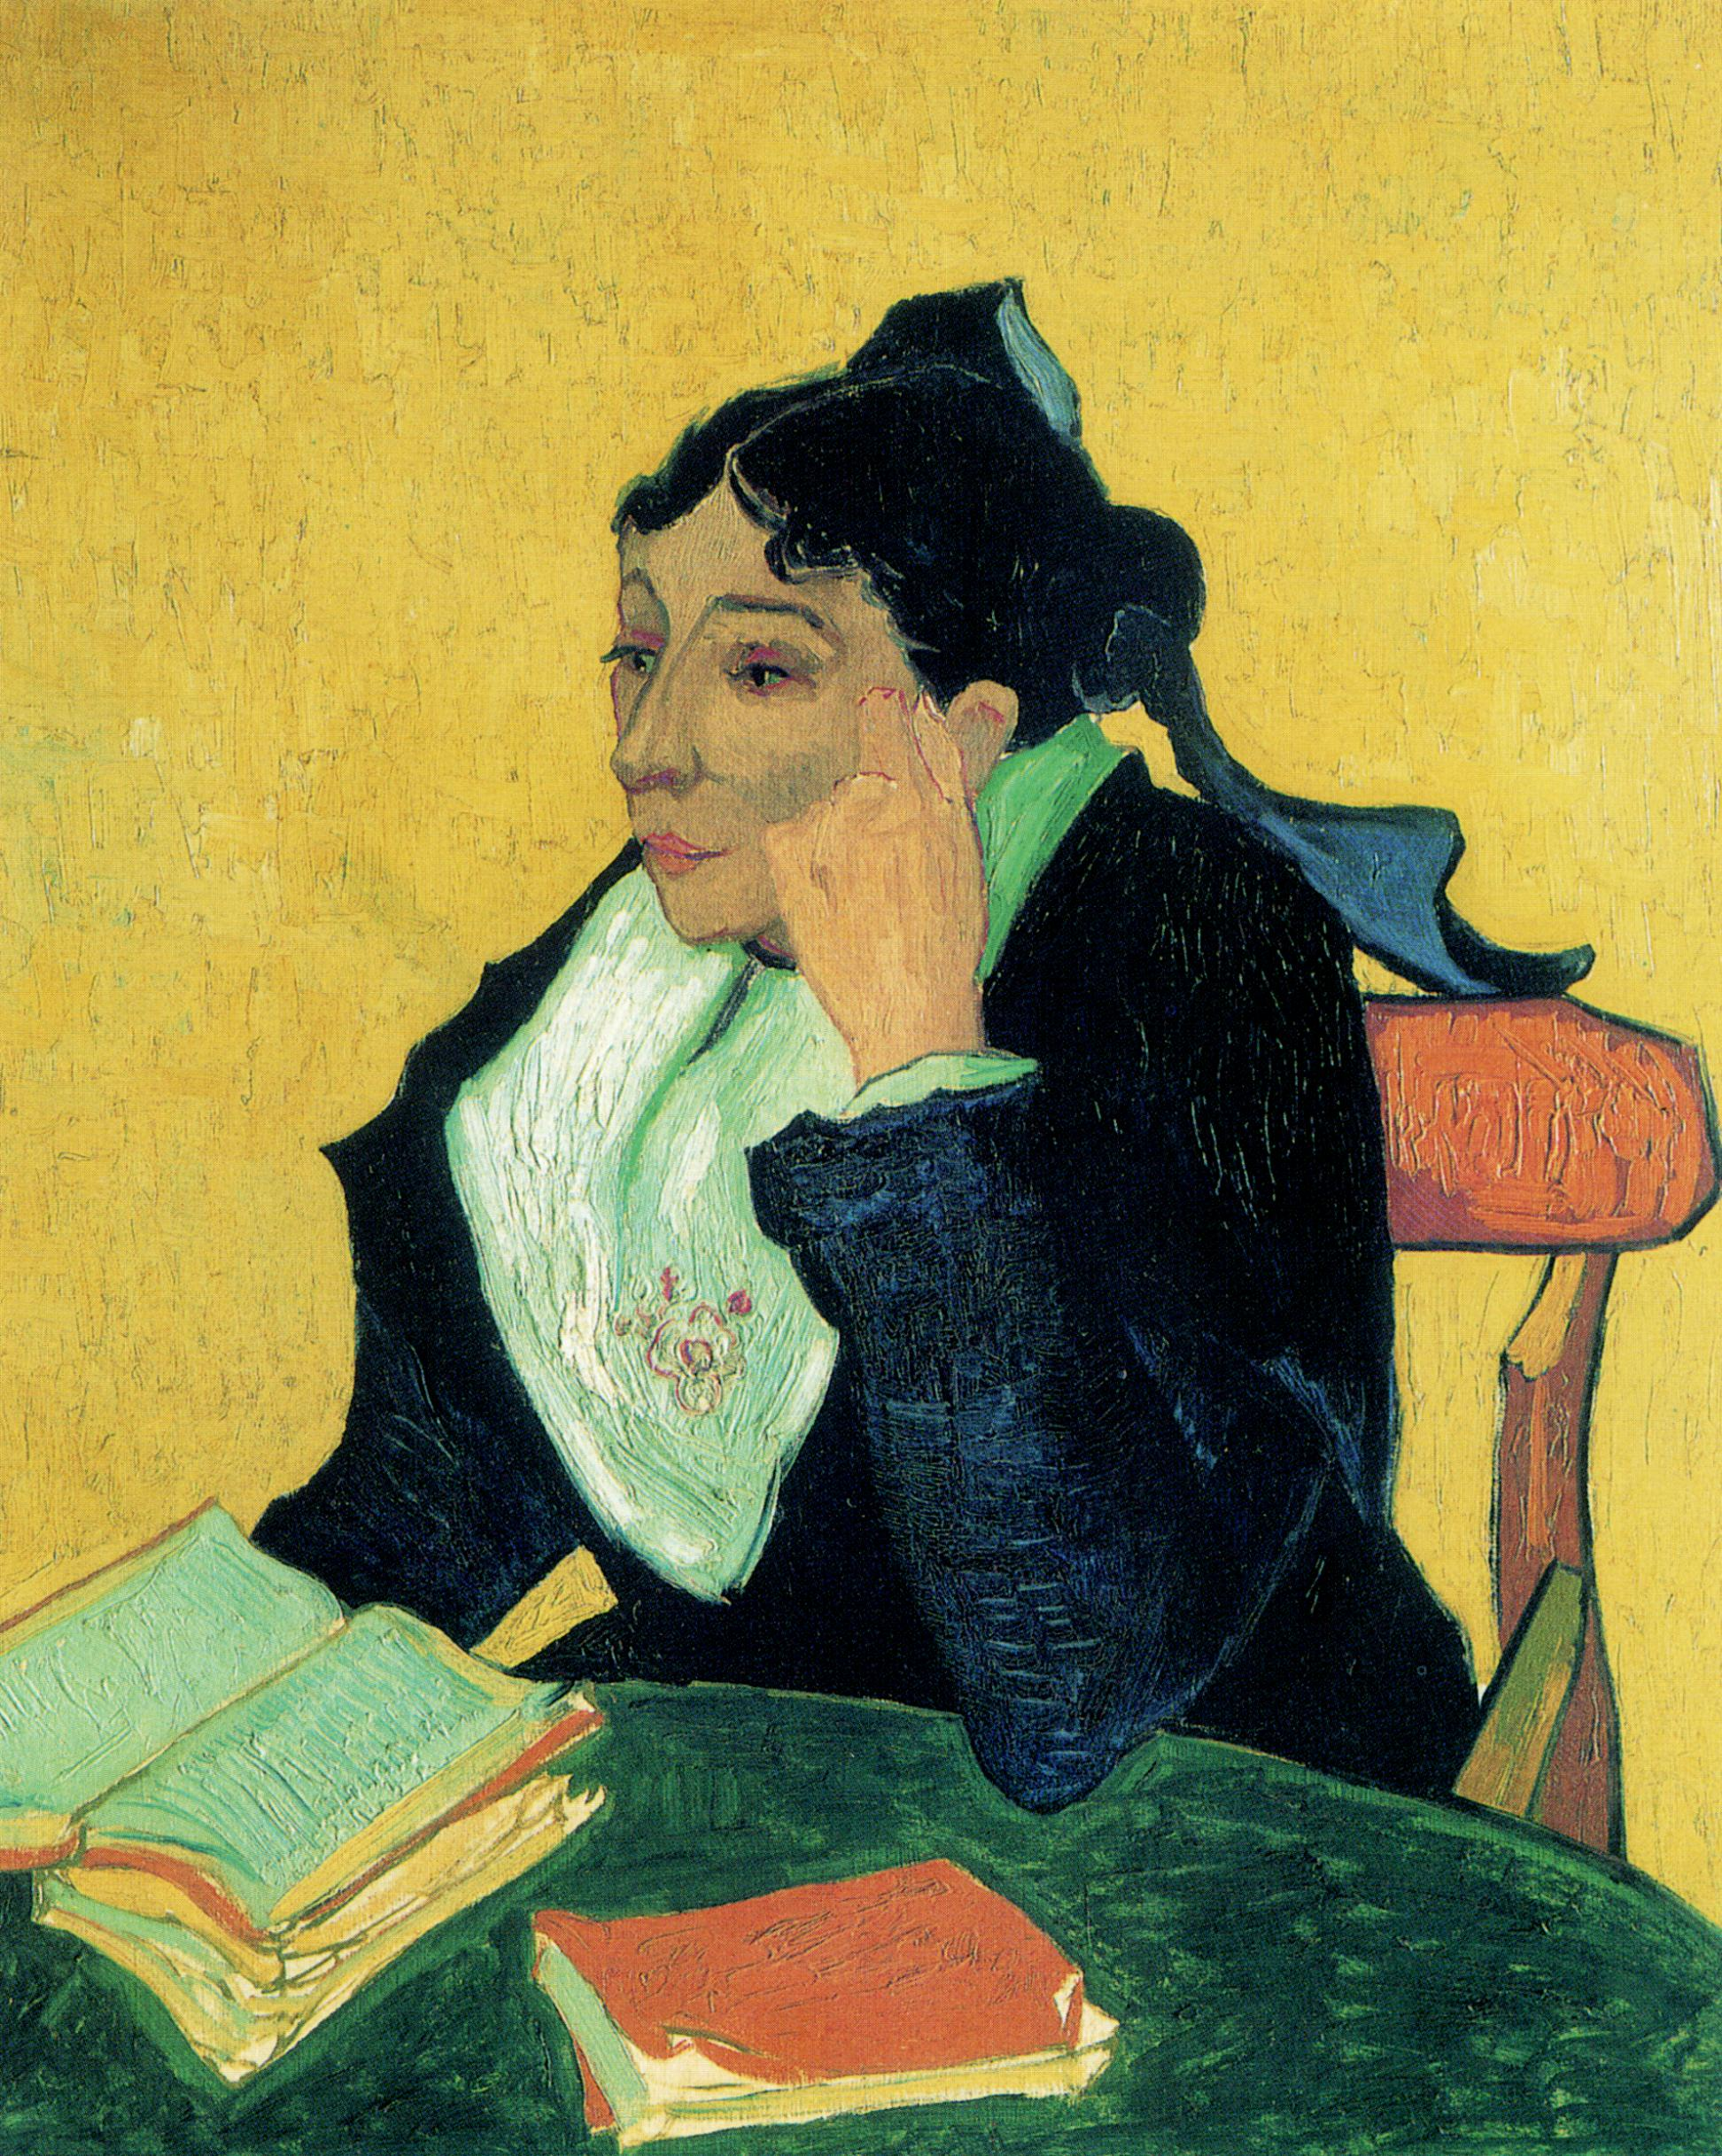 L'Arlesiana (Van Gogh 1888) - Wikipedia